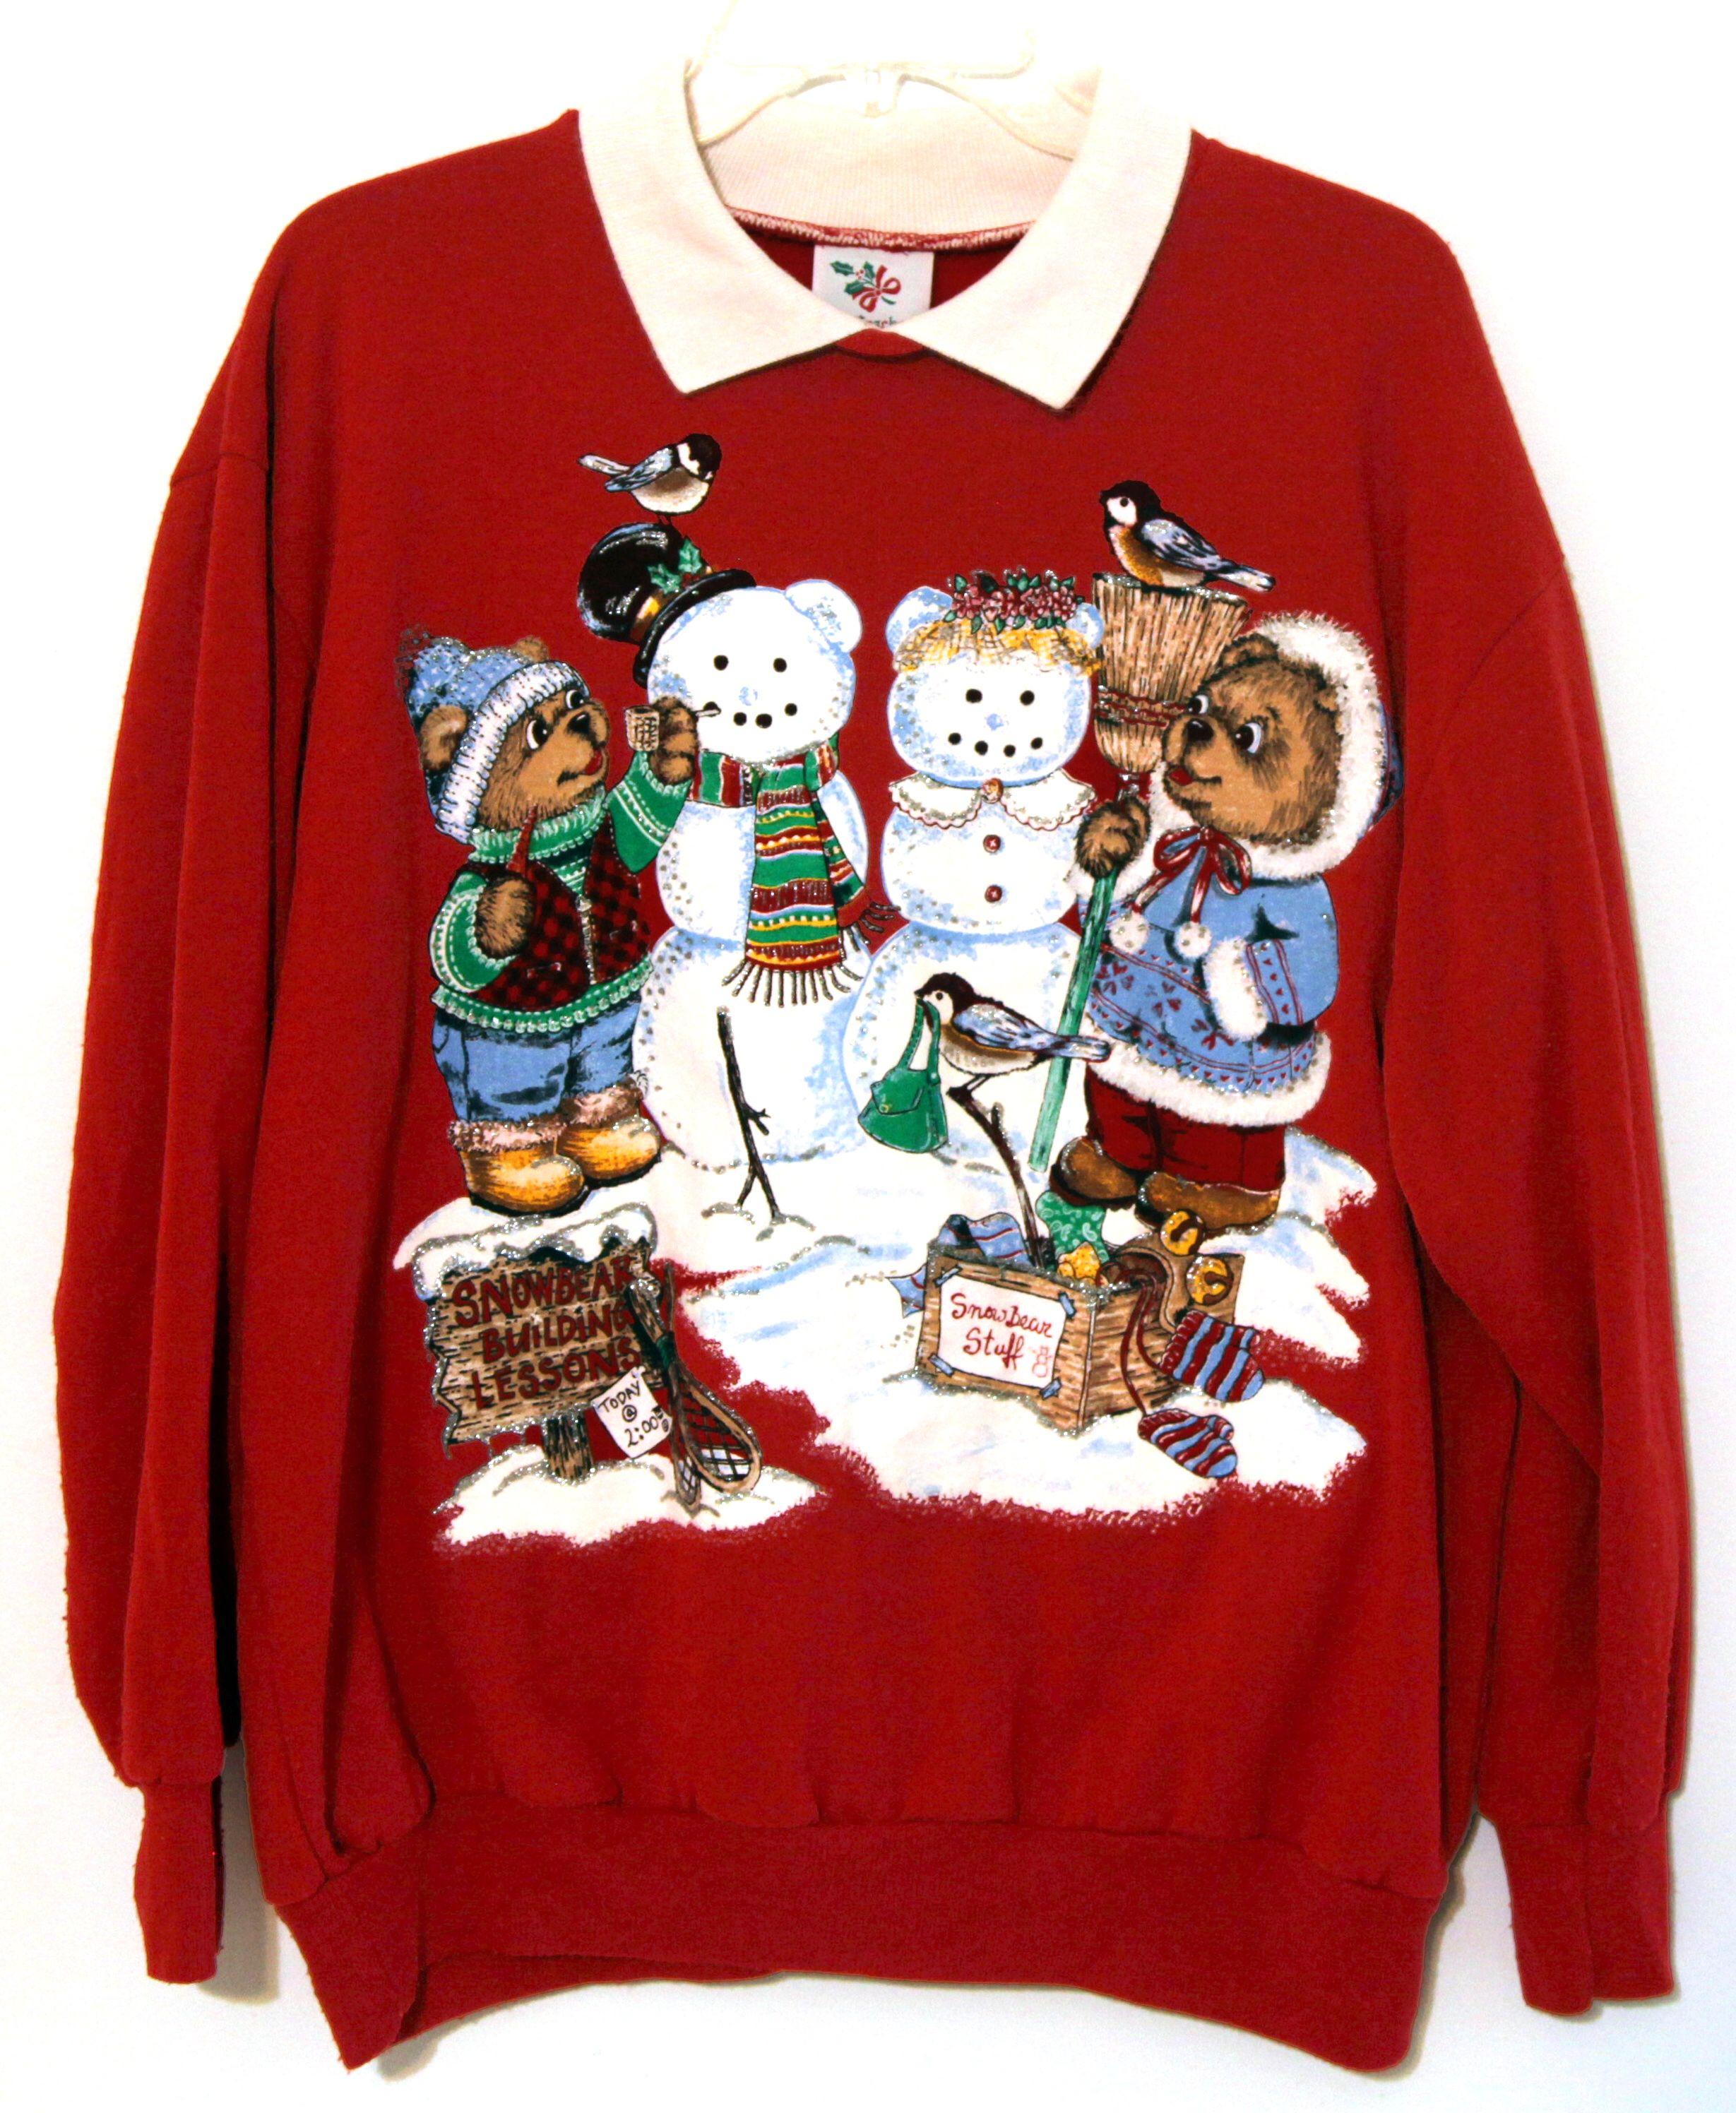 Pin on 80s 90s Christmas Sweatshirts